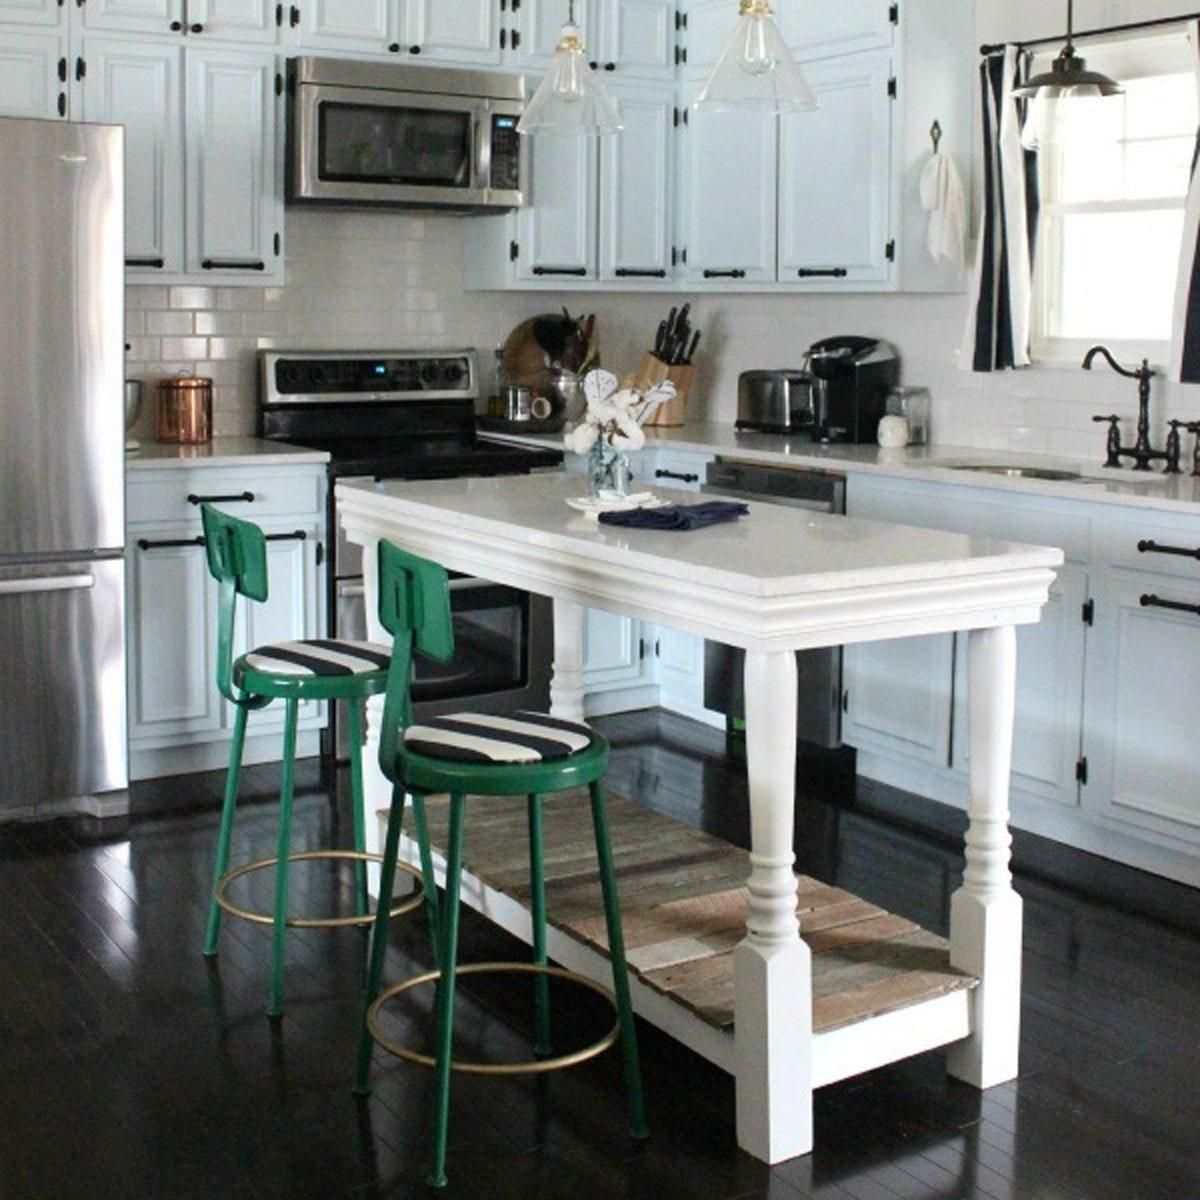 12 Great Kitchen Island Ideas: 12 Inspiring Kitchen Island Ideas